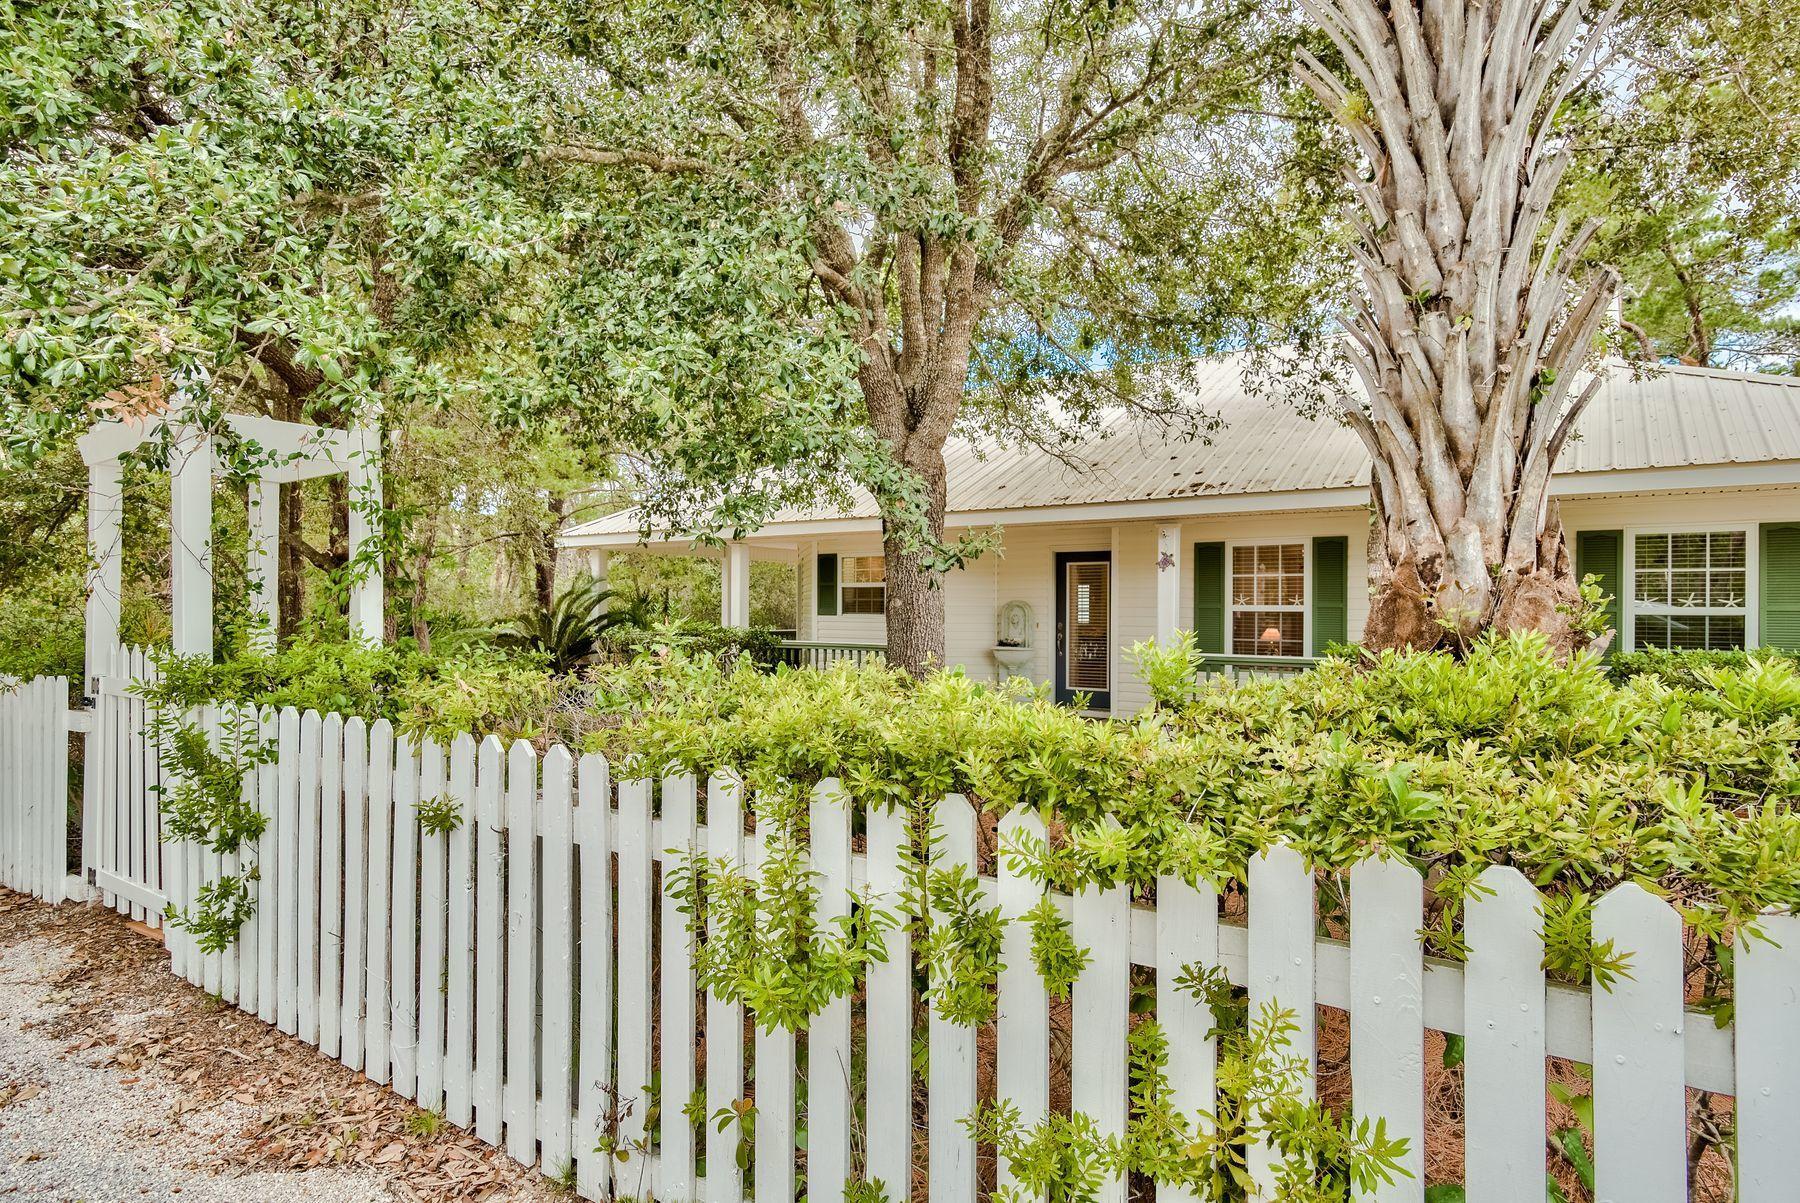 Photo of home for sale at 49 Ash, Santa Rosa Beach FL